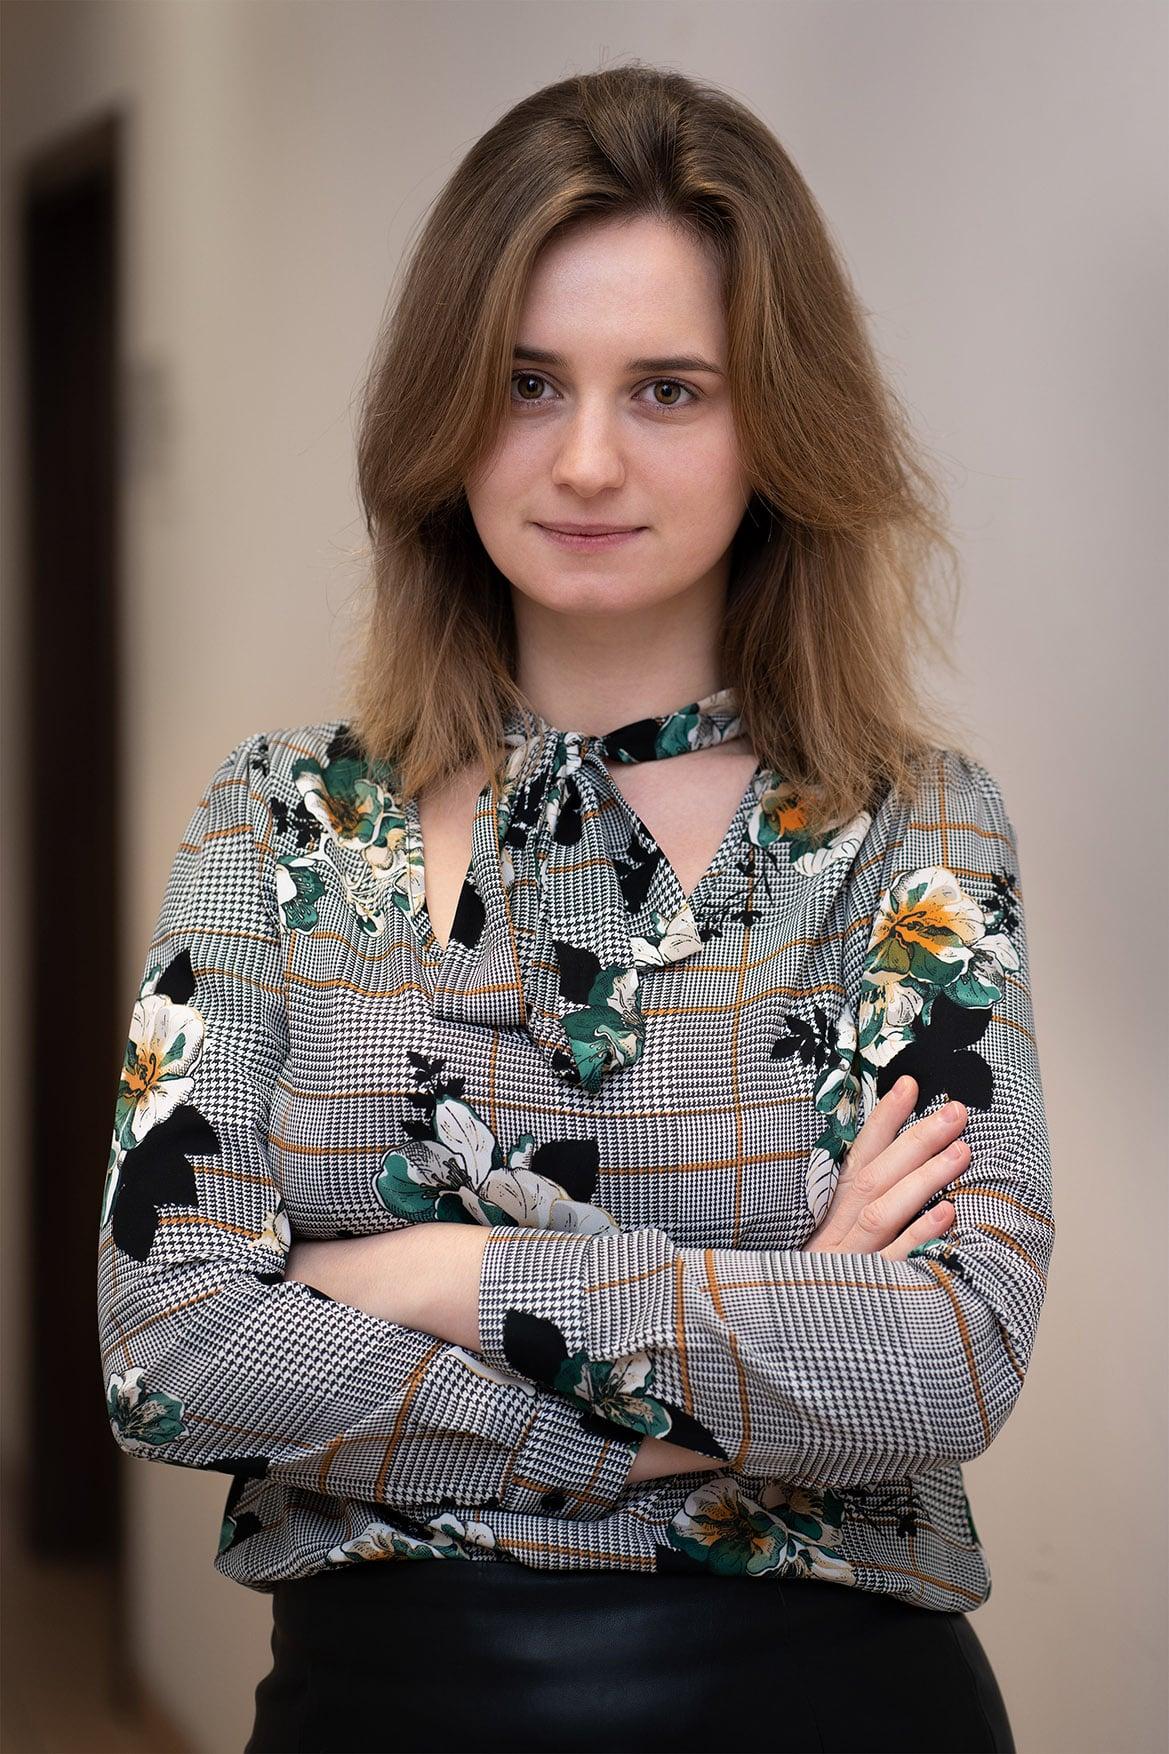 Aleksandra Borodziuk